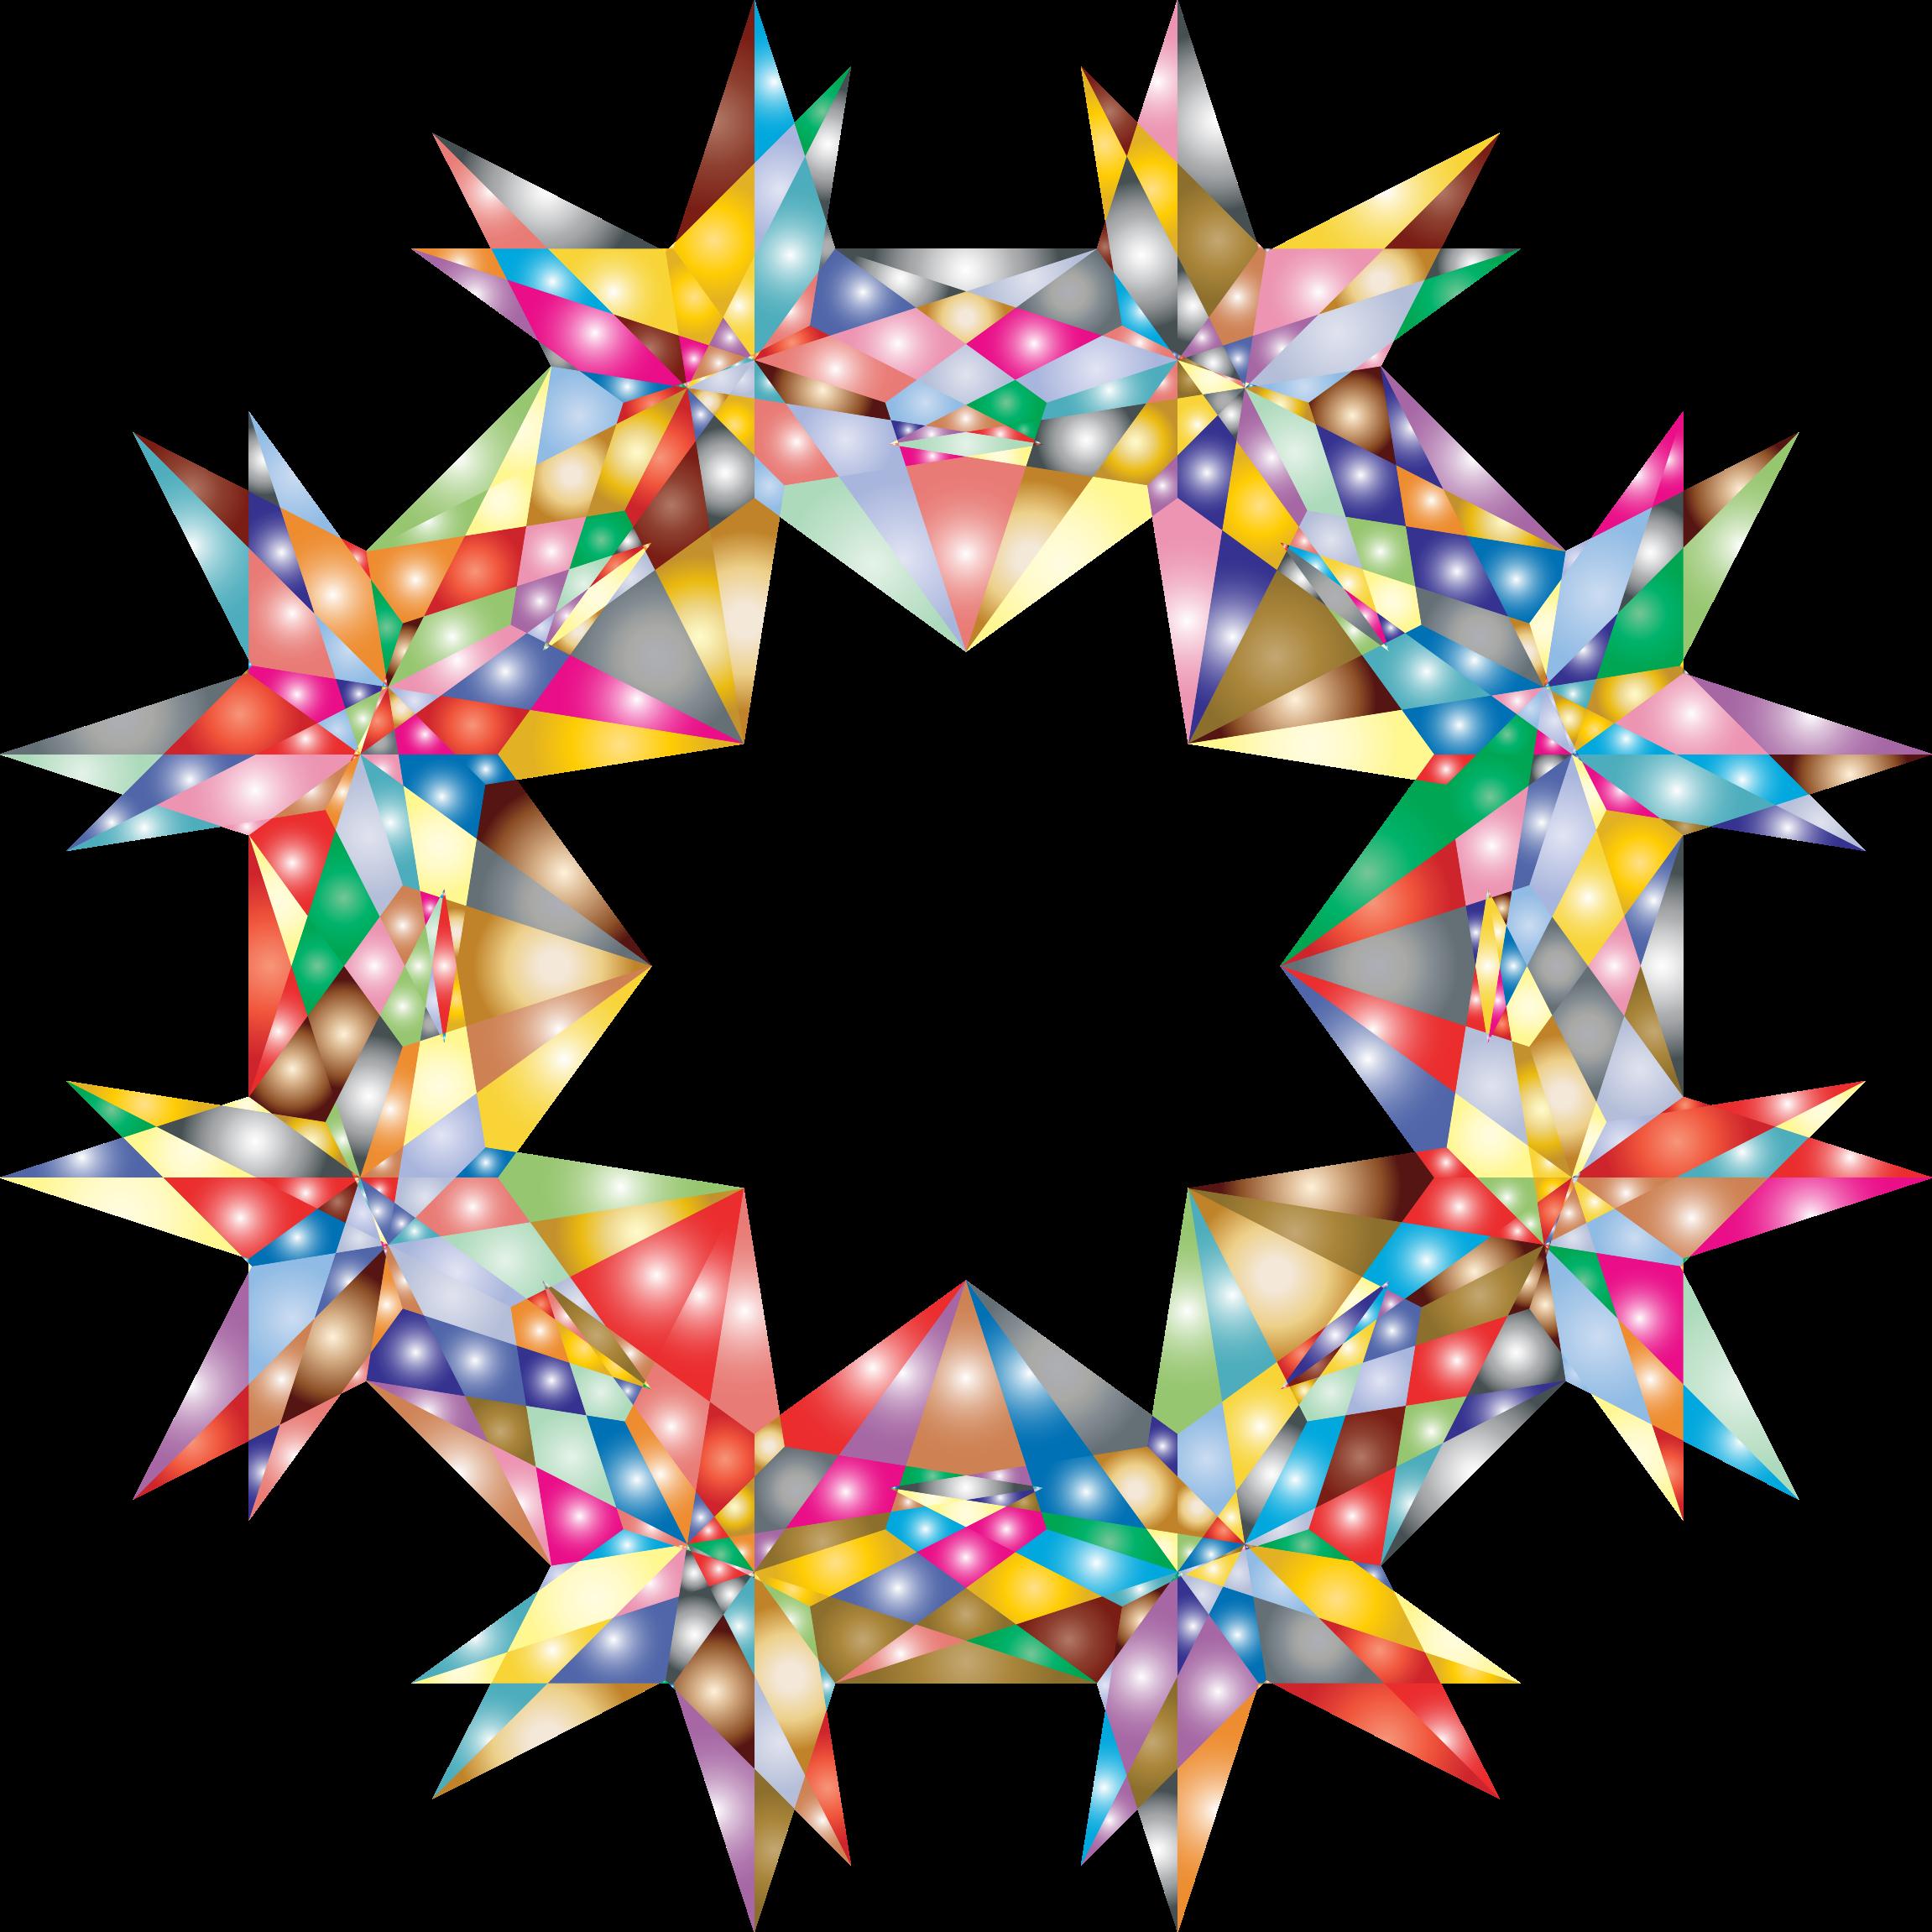 Gem clipart colorful thing. Geometric star big image